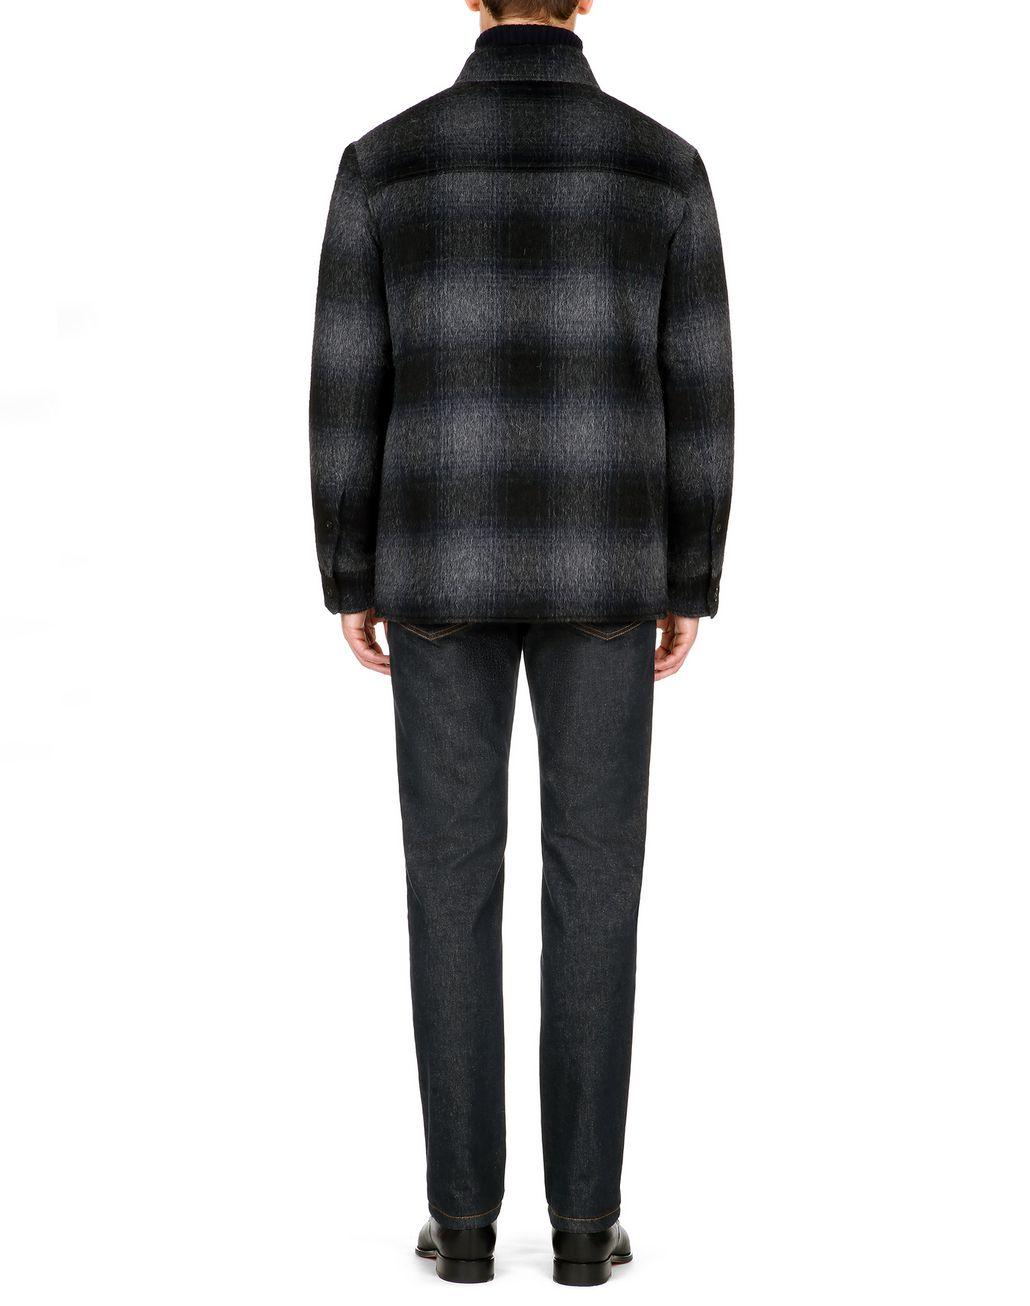 BRIONI Канадская куртка антрацитового цвета Верхняя одежда [*** pickupInStoreShippingNotGuaranteed_info ***] d